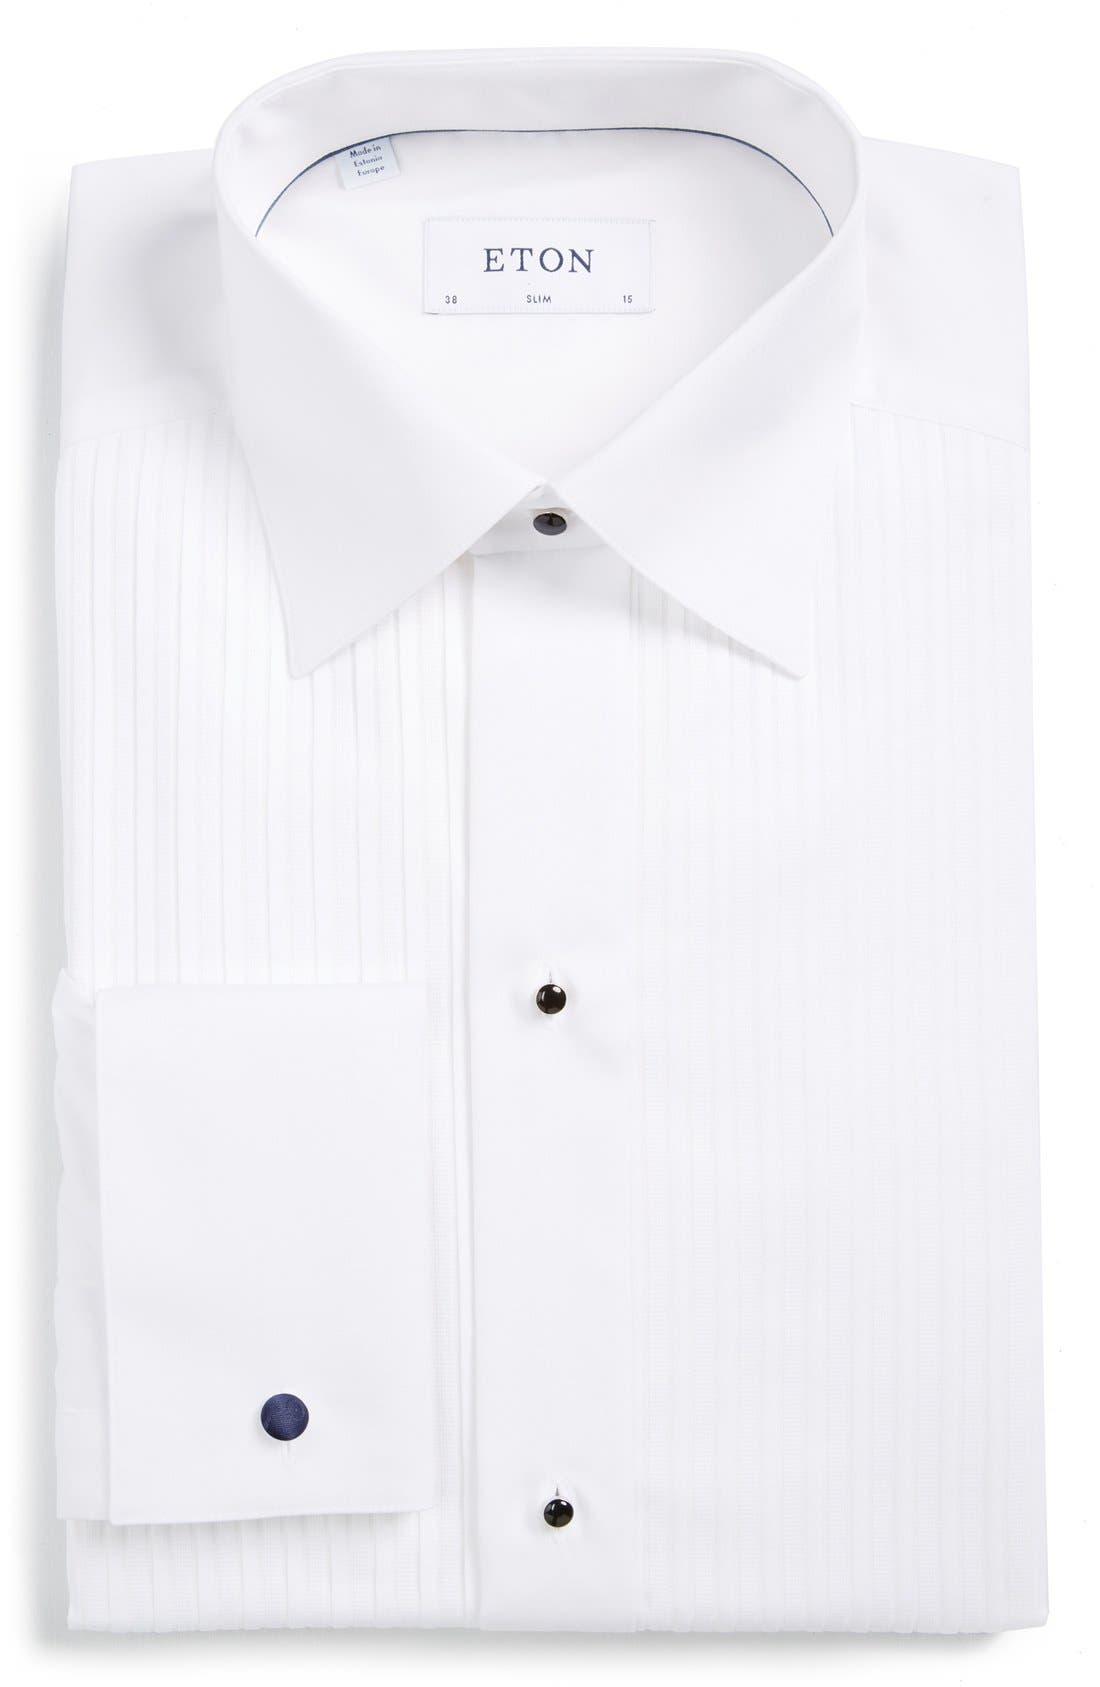 Eton Slim Fit Tuxedo Shirt